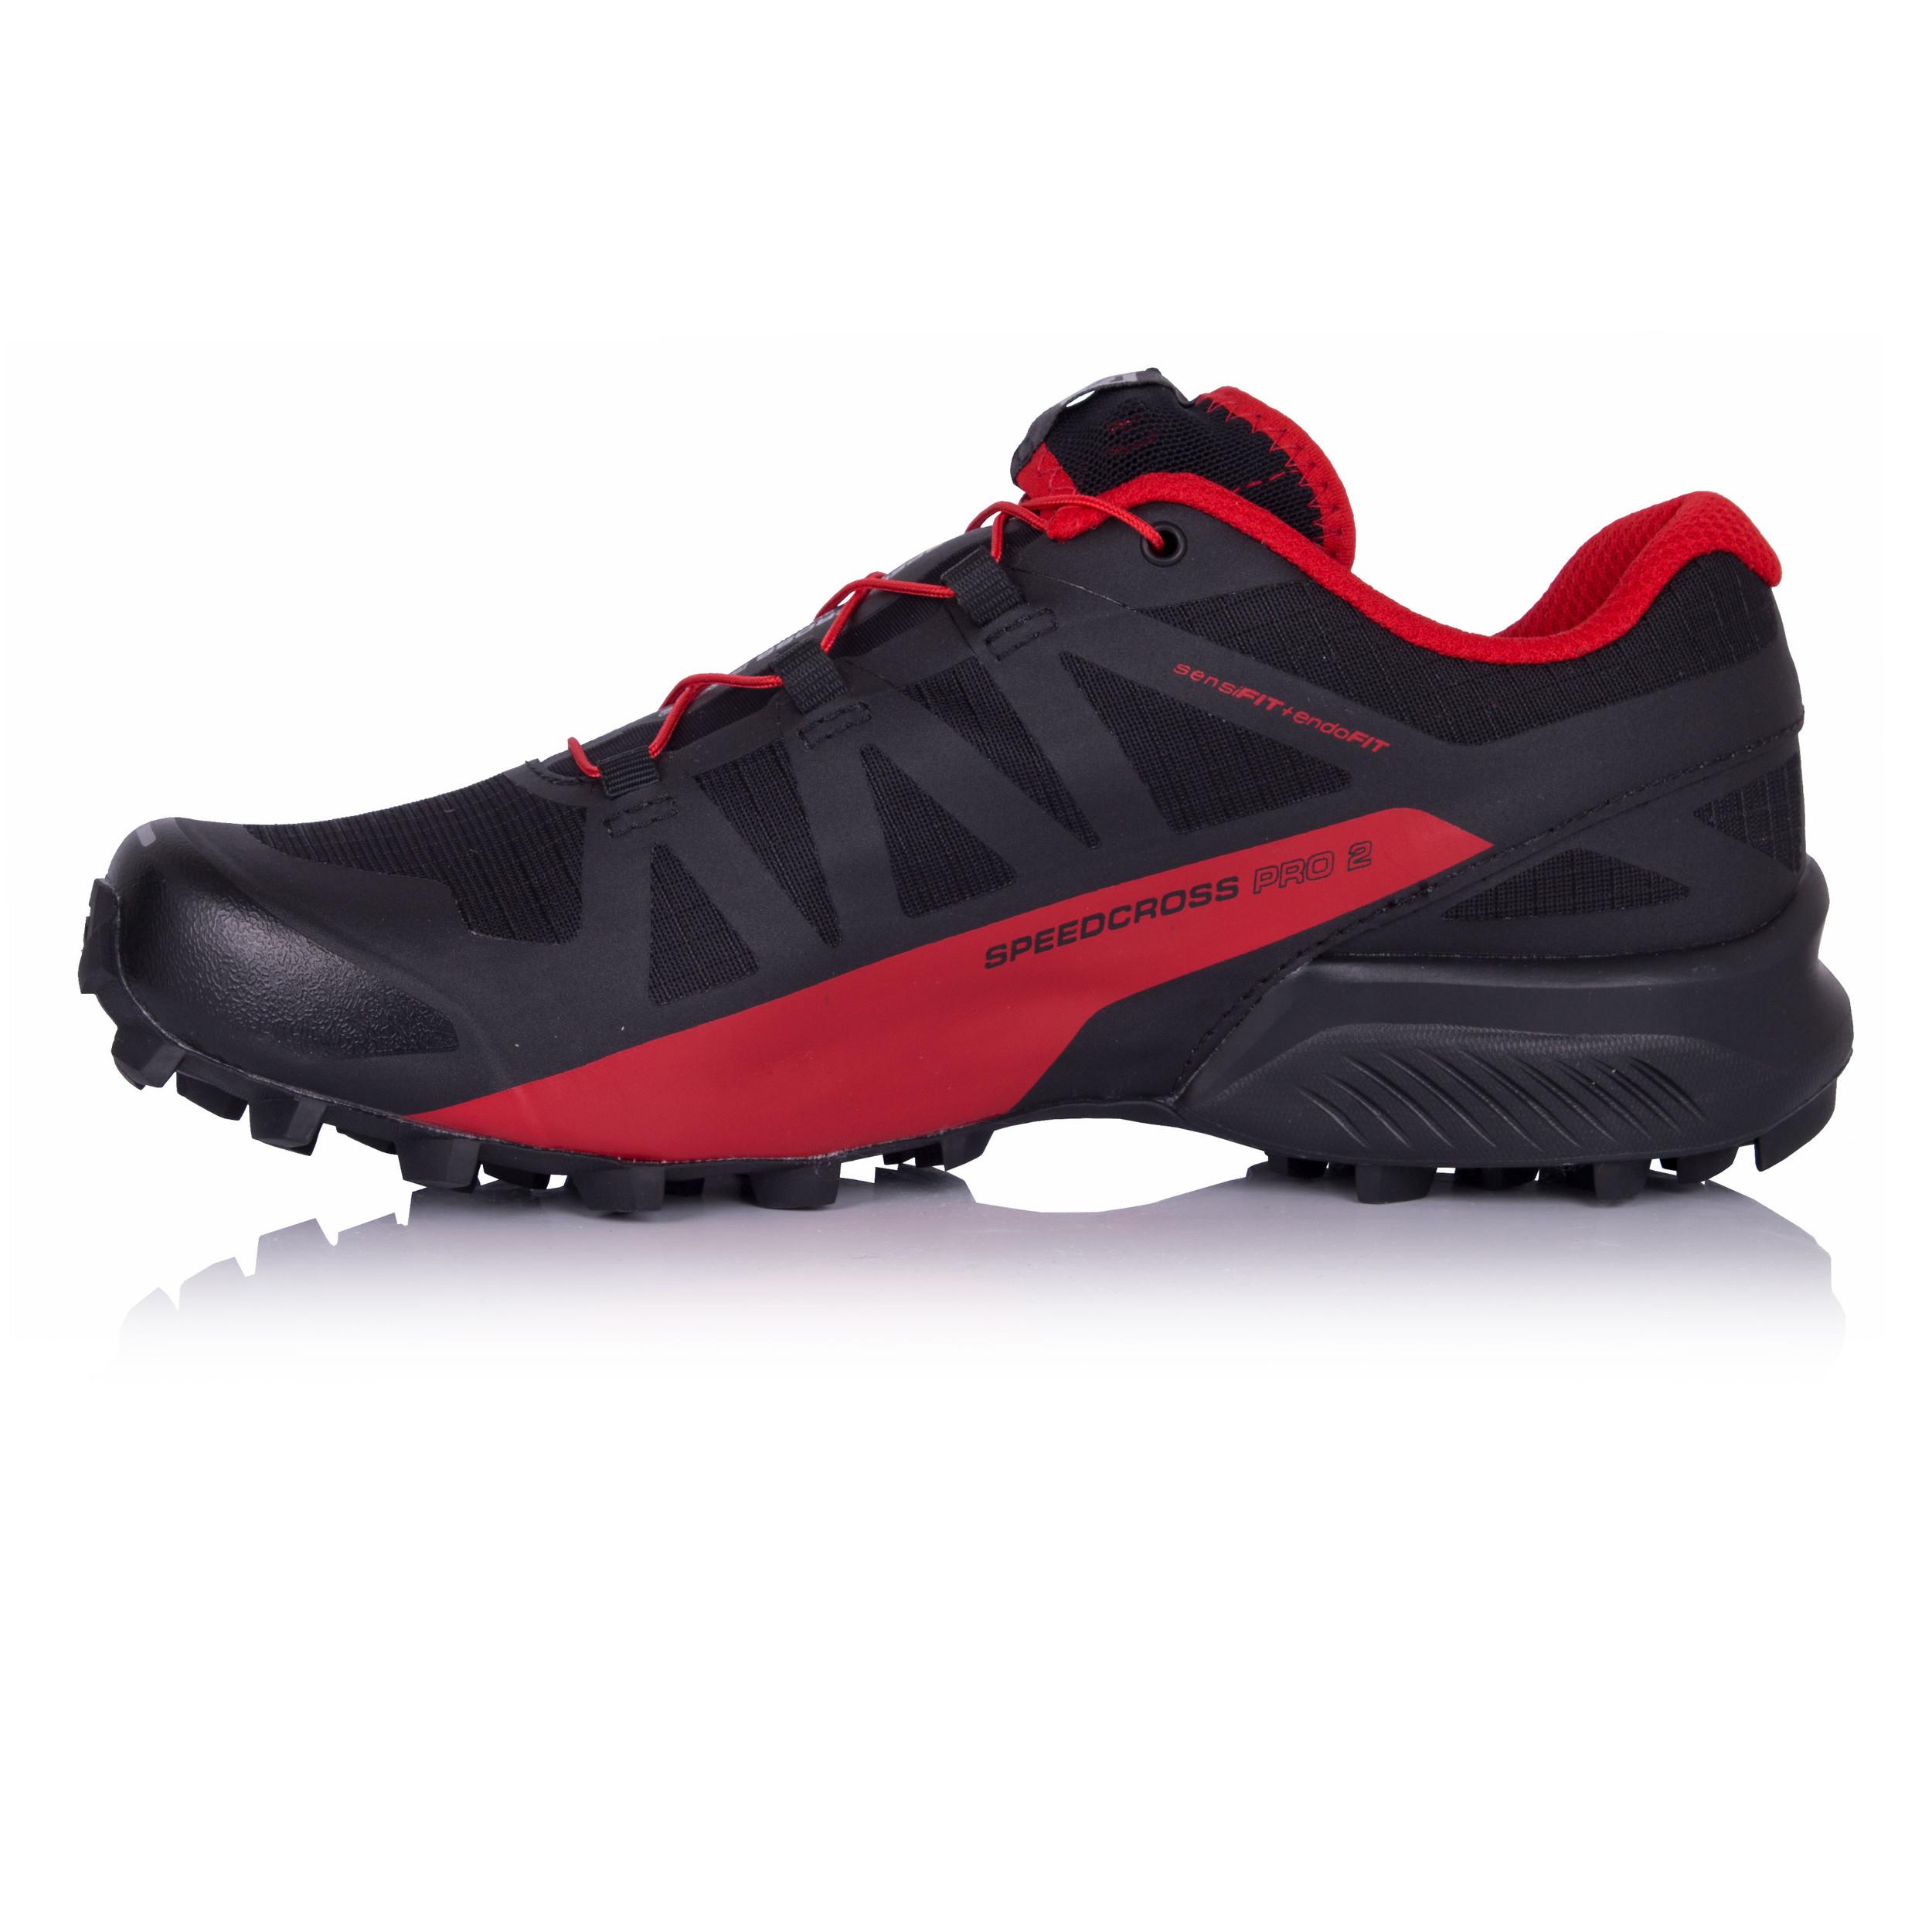 Salomon Running Shoes Ebay